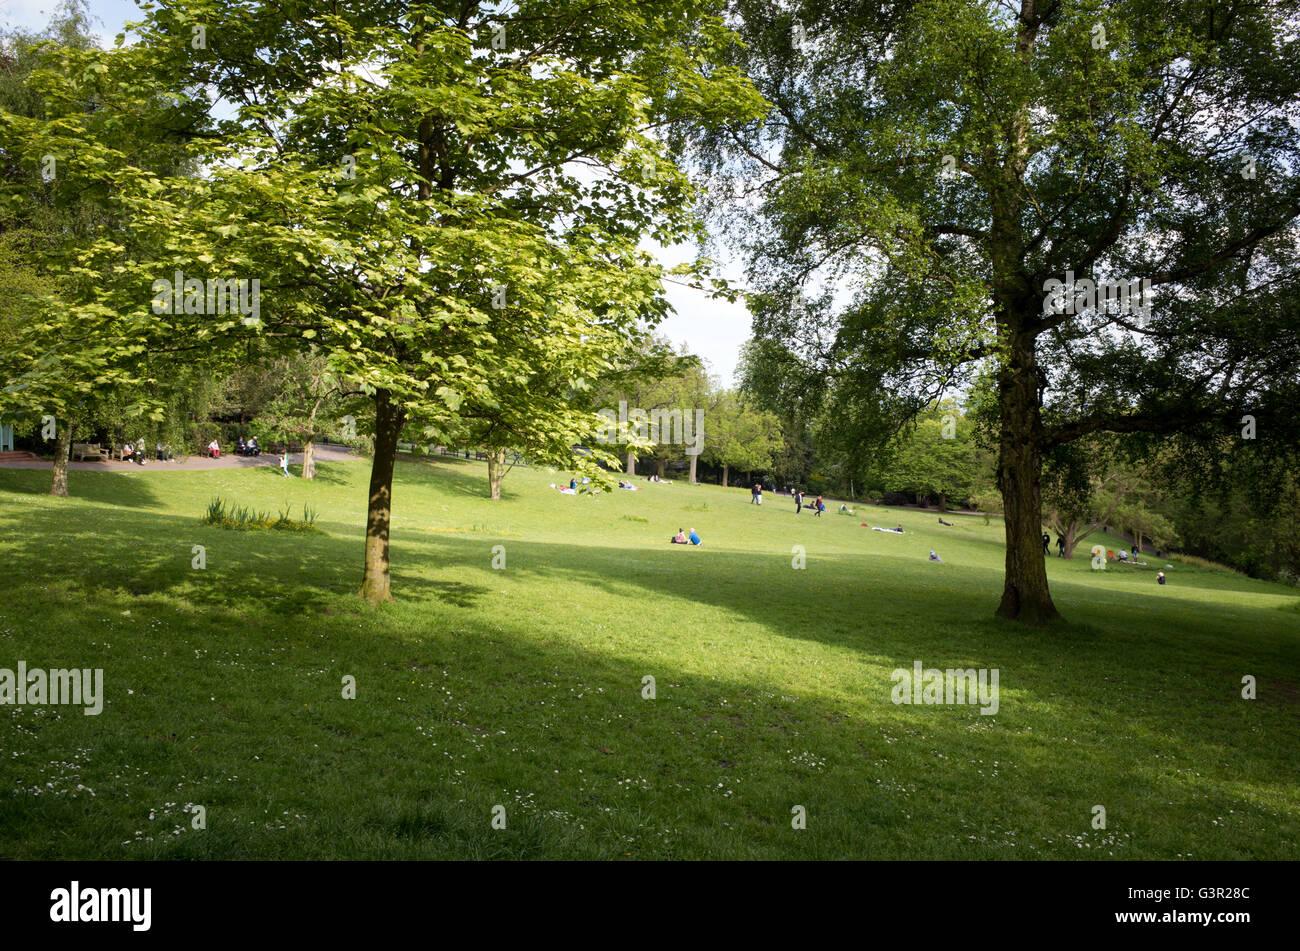 Waterlow Park in Highgate, London, England, UK - Stock Image